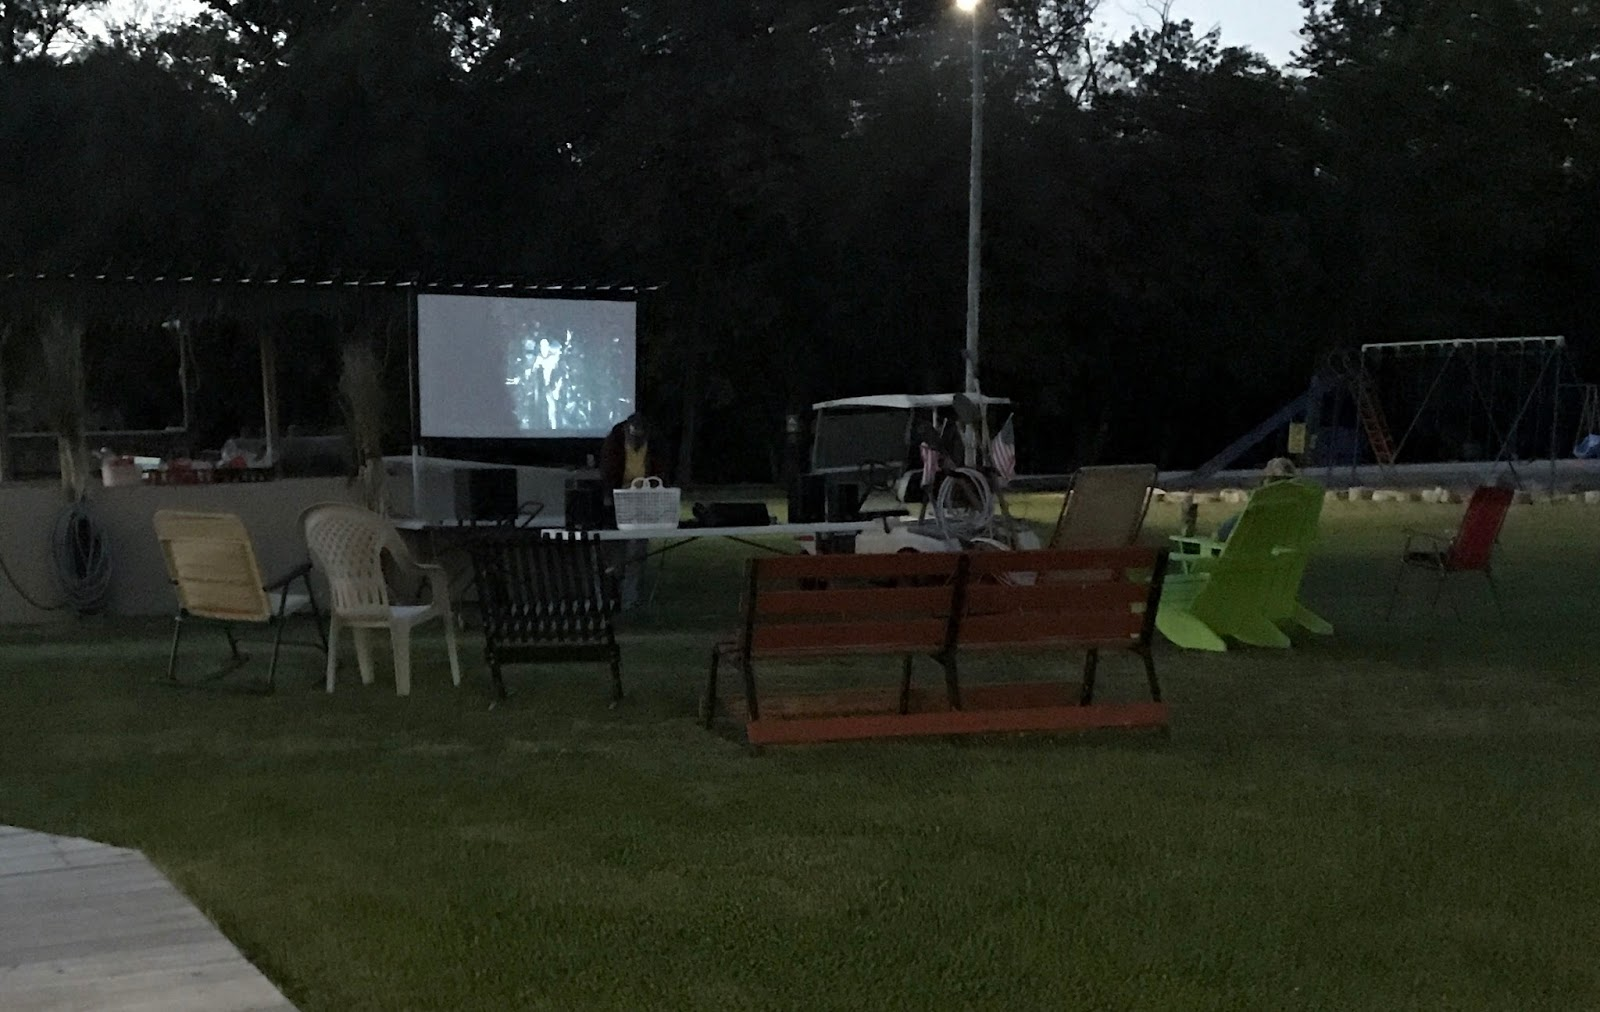 kathy u0027s kampground kapers dinner and a movie